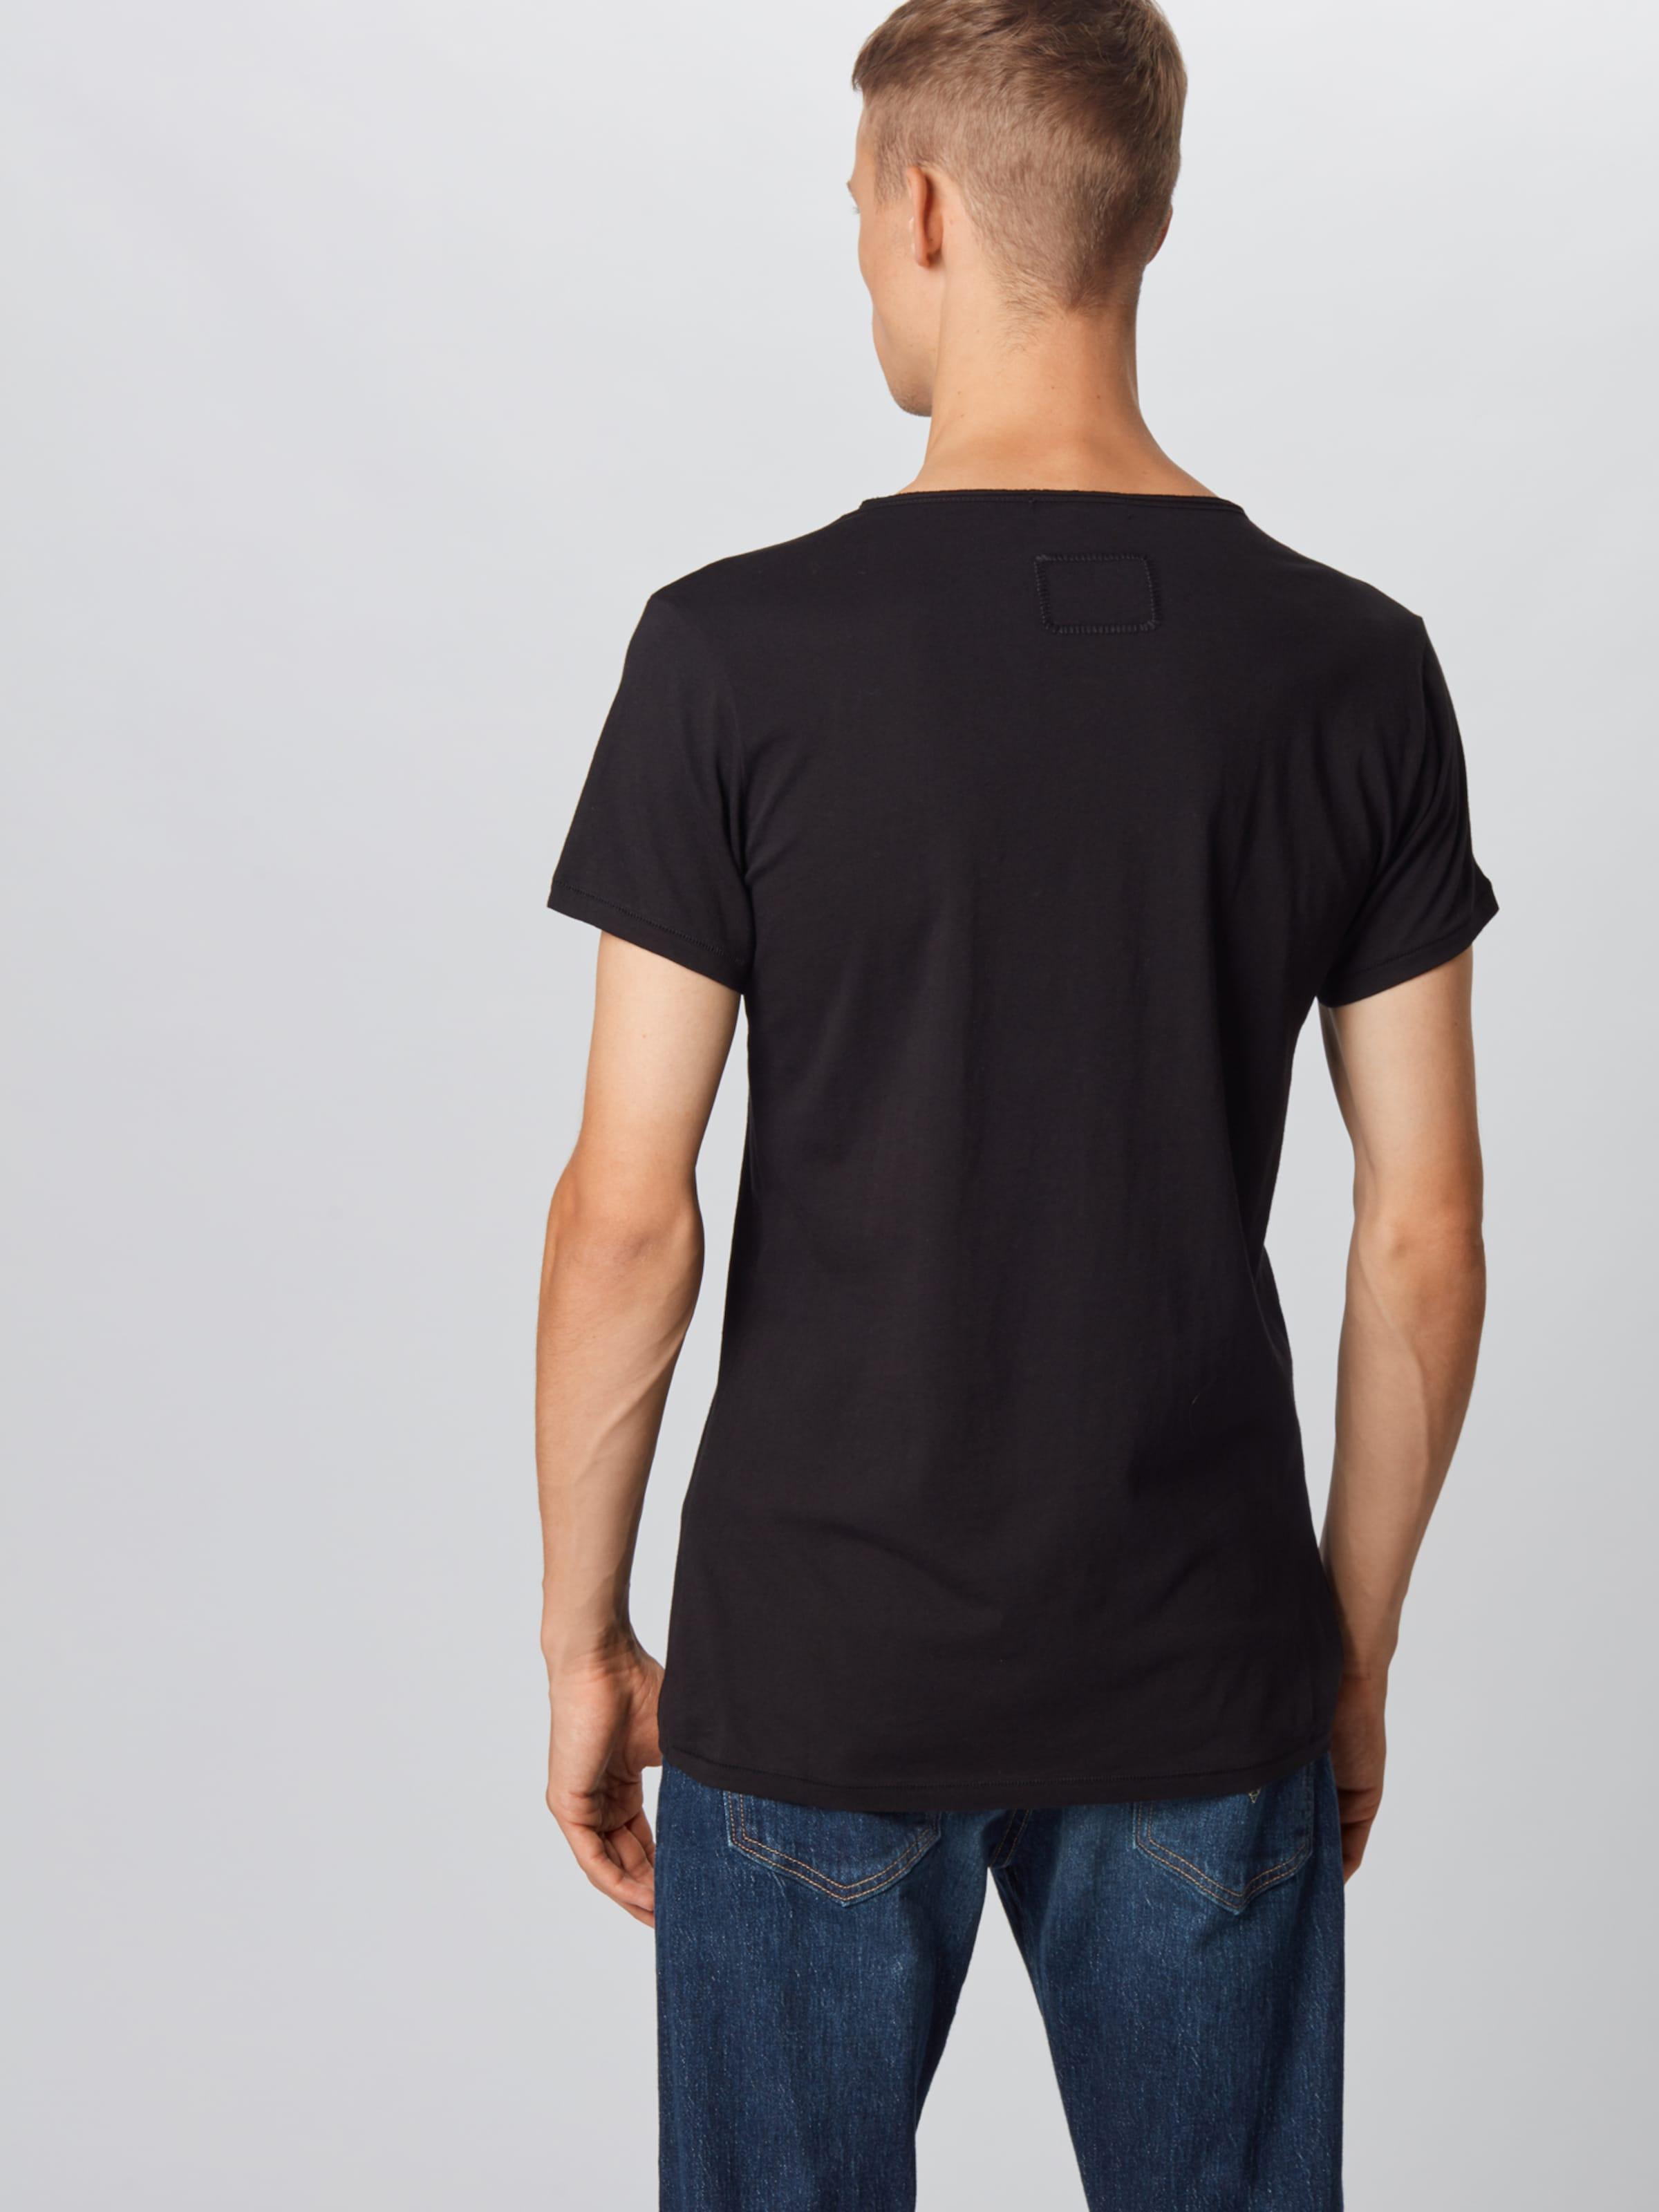 shirt T En Msn' Tigha 'ghost Noir Crow rdxBoWCe